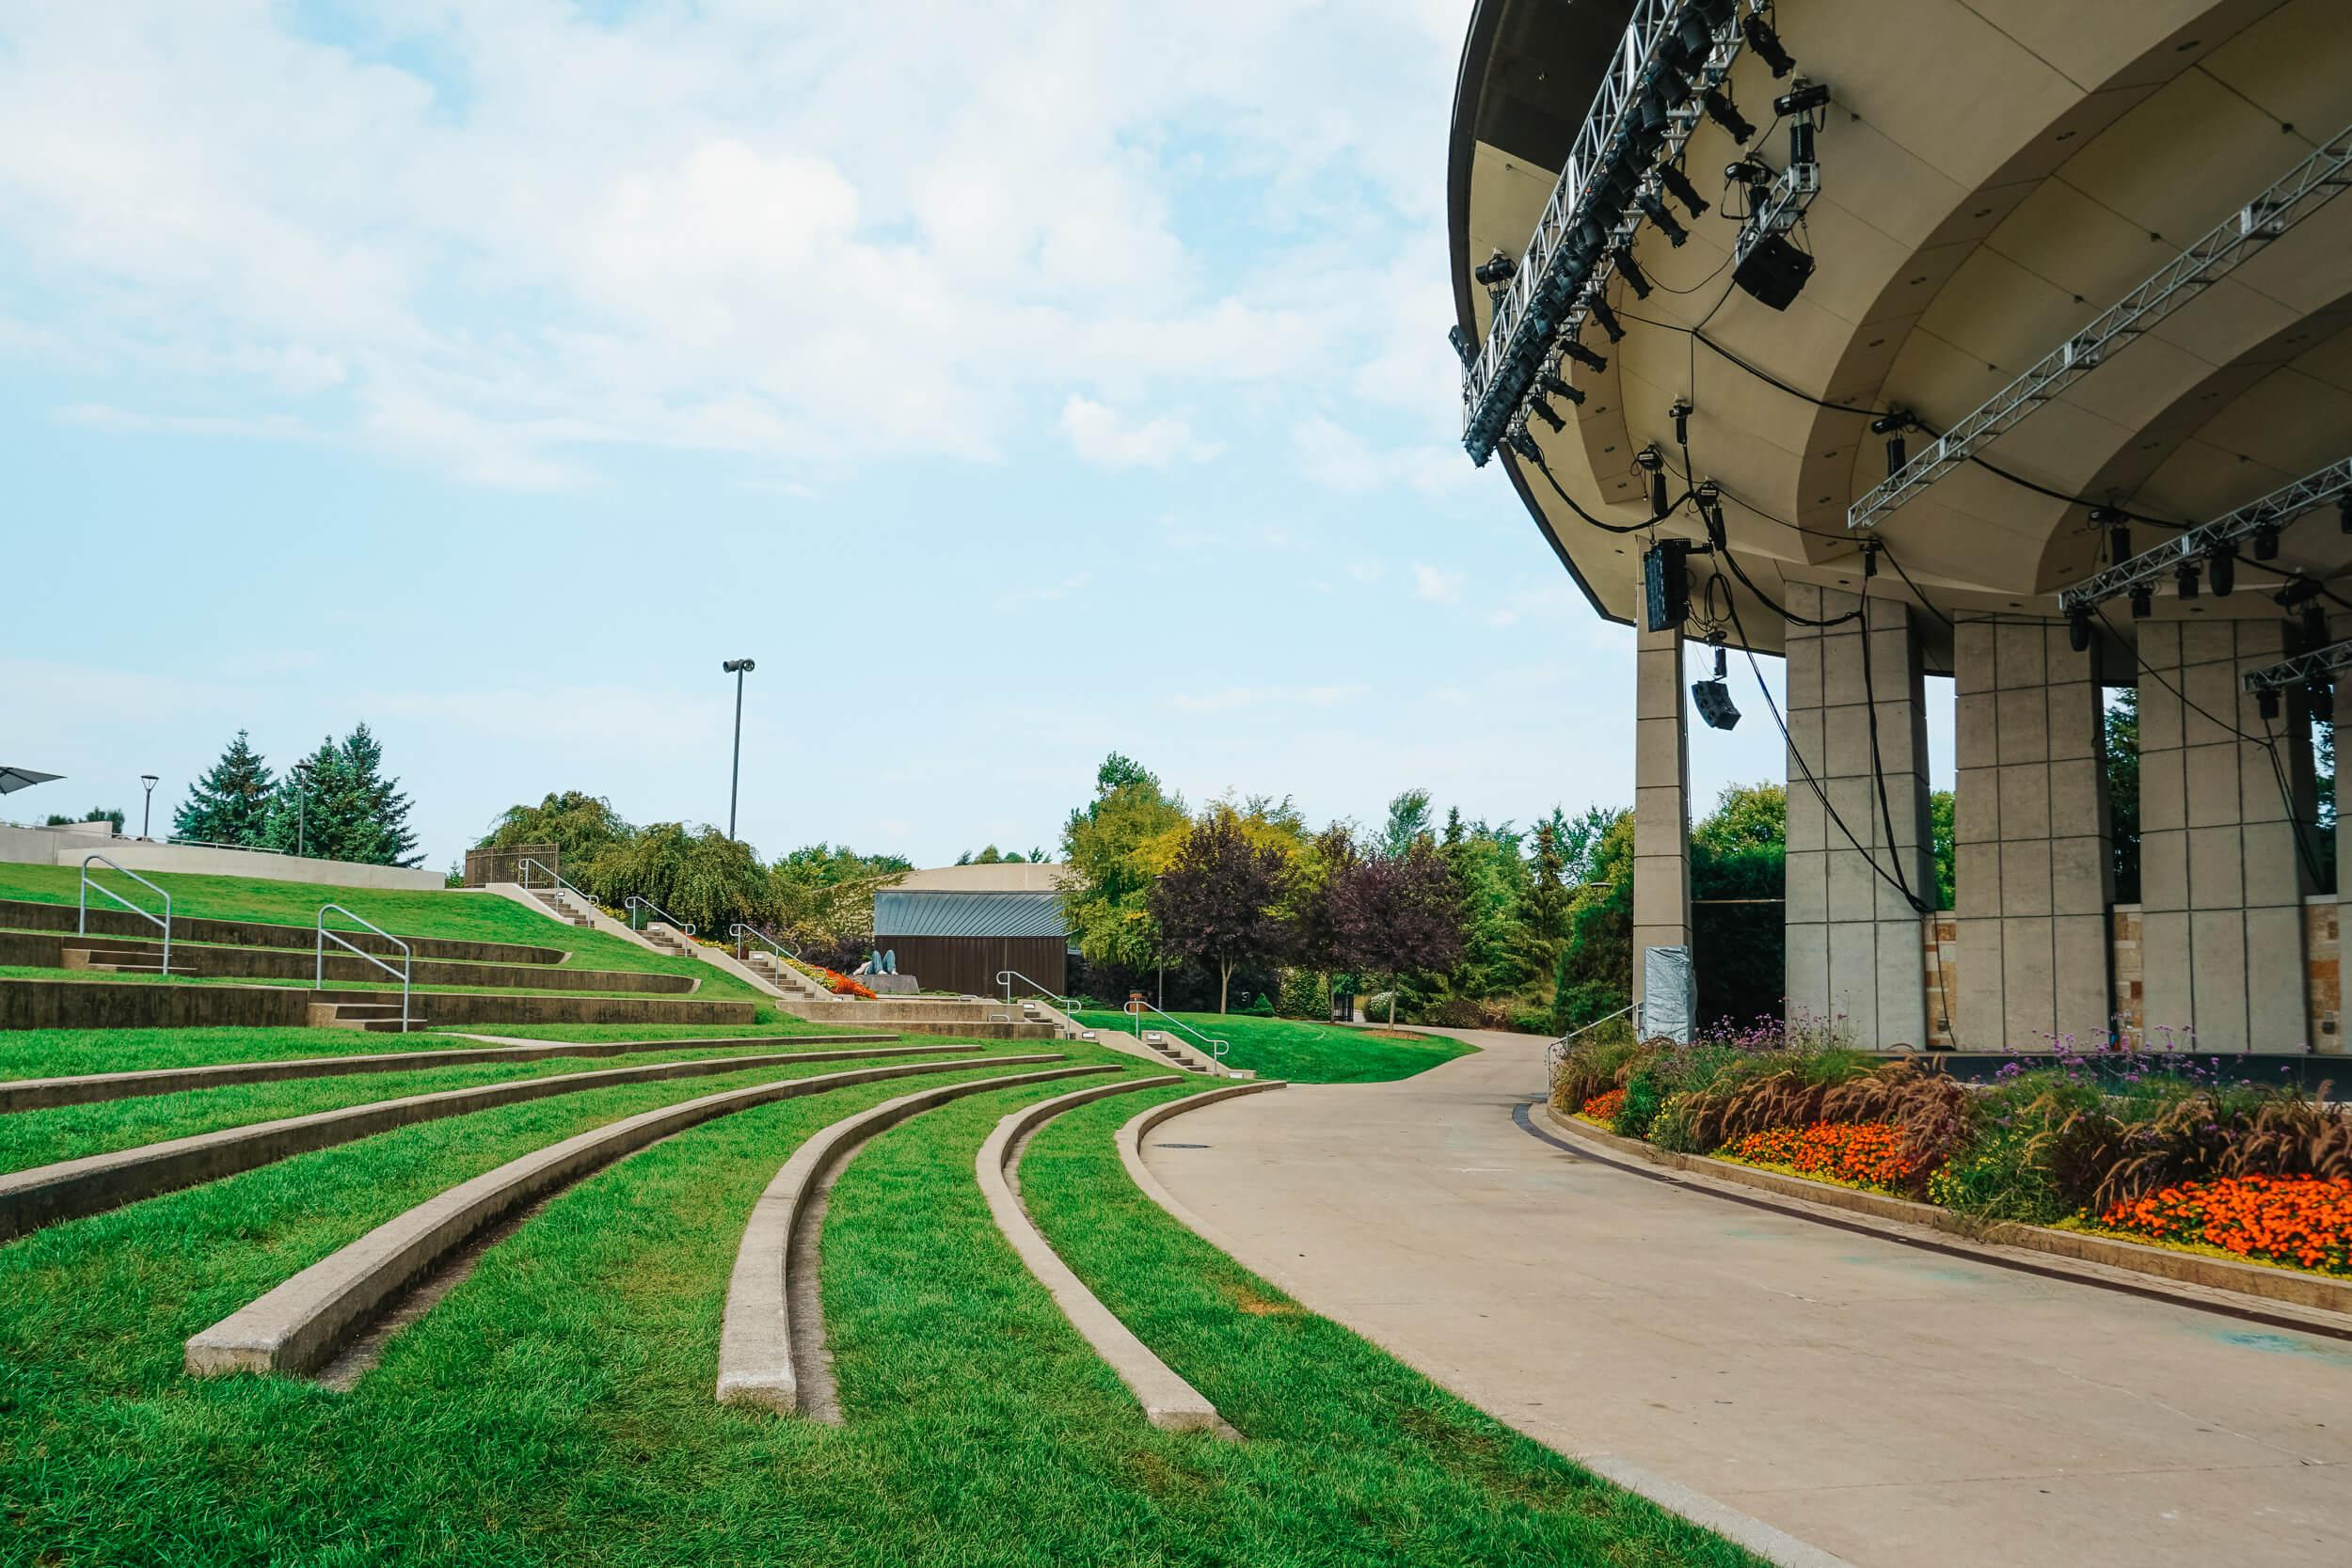 Photo Story: The Frederik Meijer Gardens & Sculpture Park in